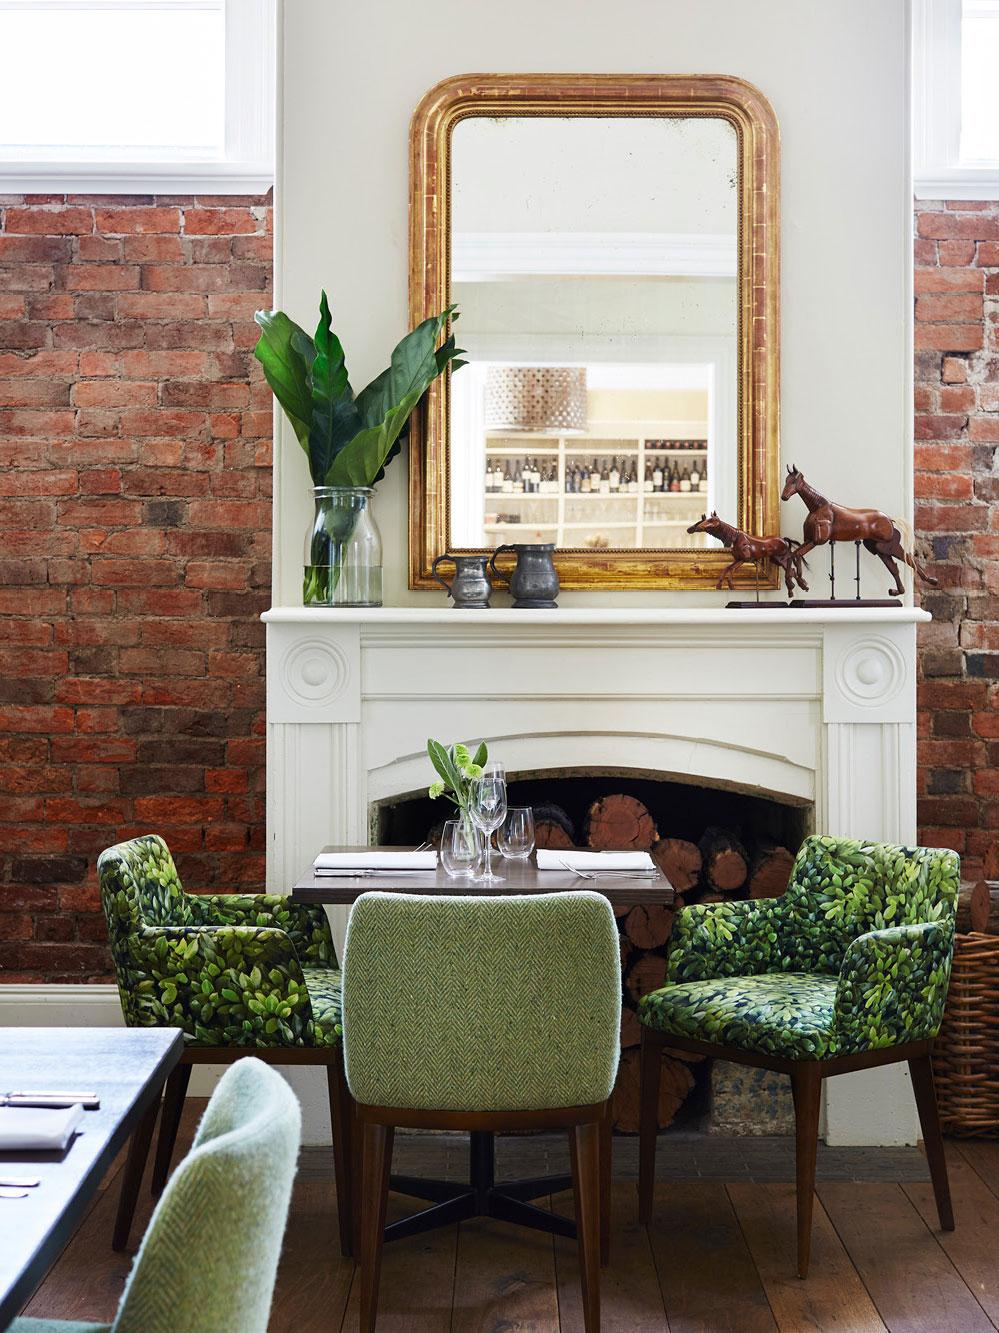 Adelaide-Bragg-Interiors-The-Cottage-Scone_web.jpg